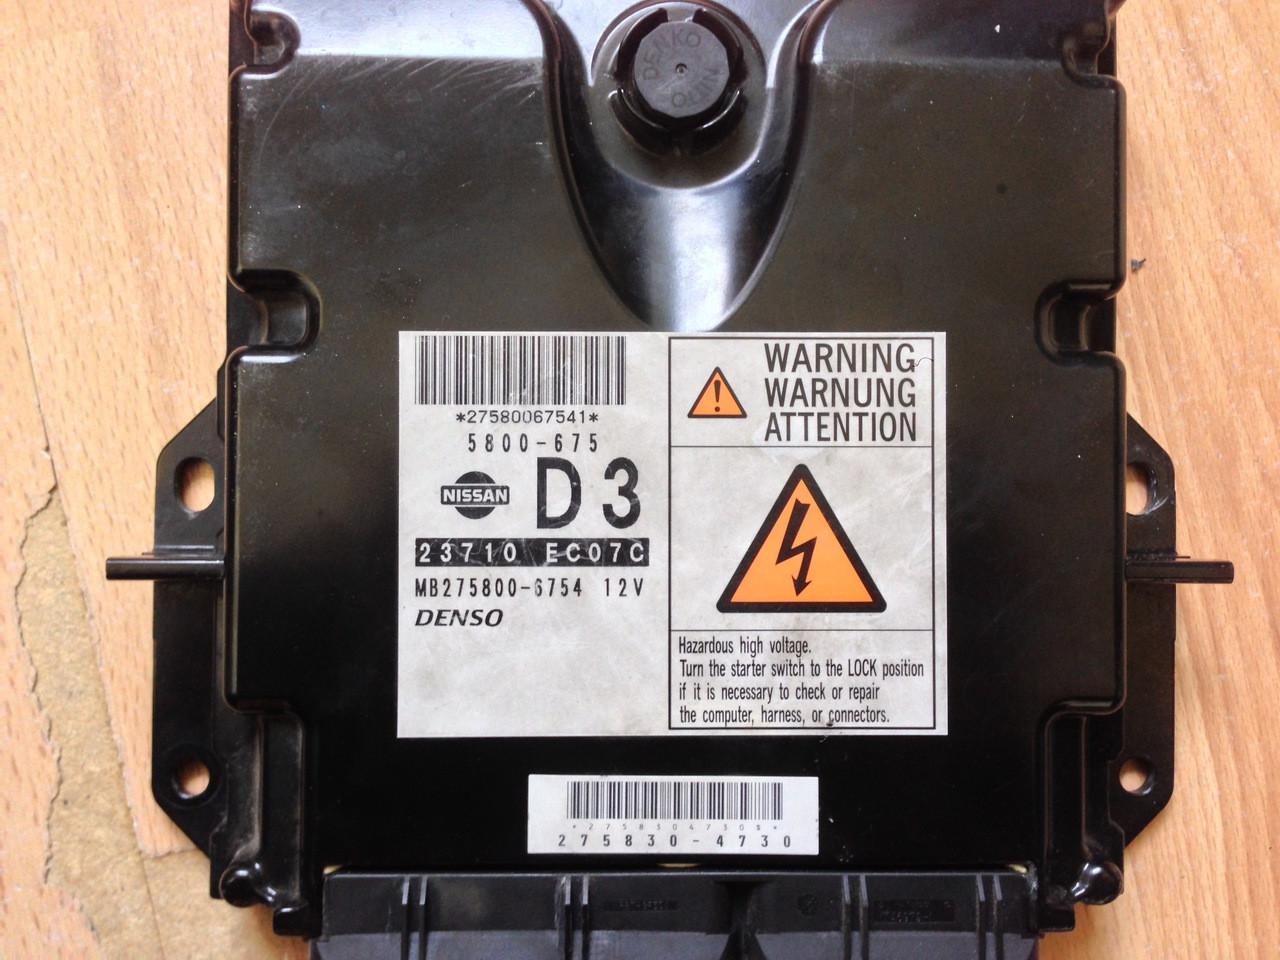 Plug & Play Denso Engine ECU, Nissan, 23710 EC07C, MB275800-6754, 5800-675,  D3